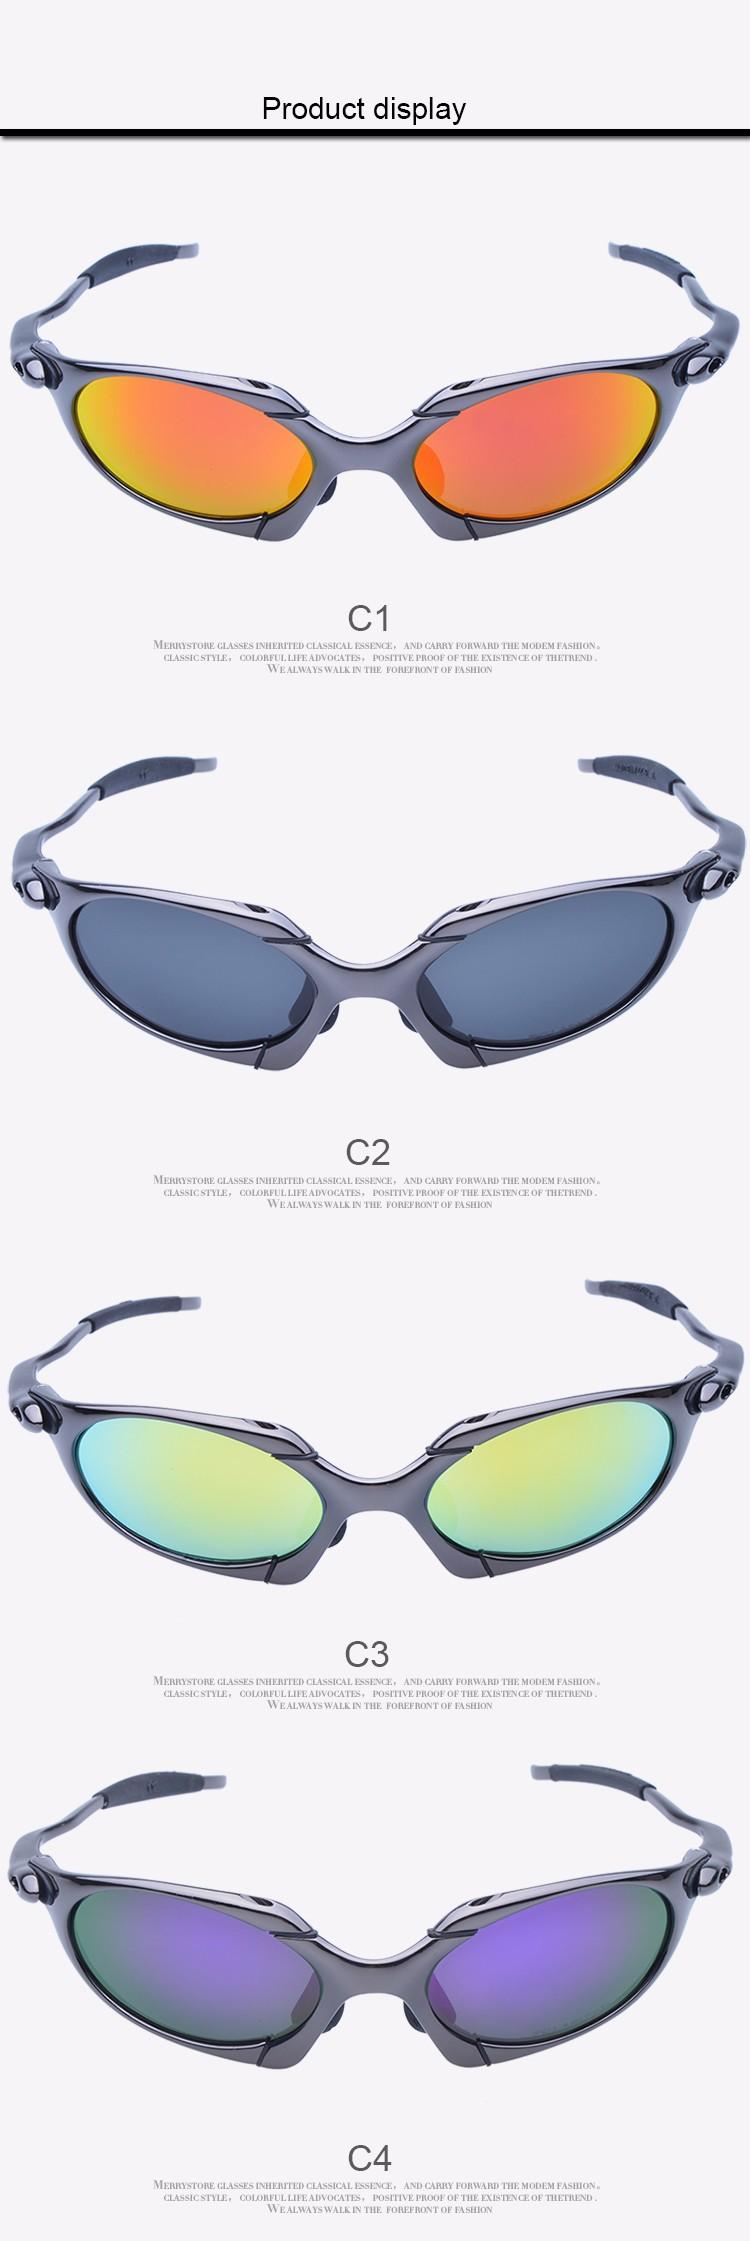 CP002-1_05